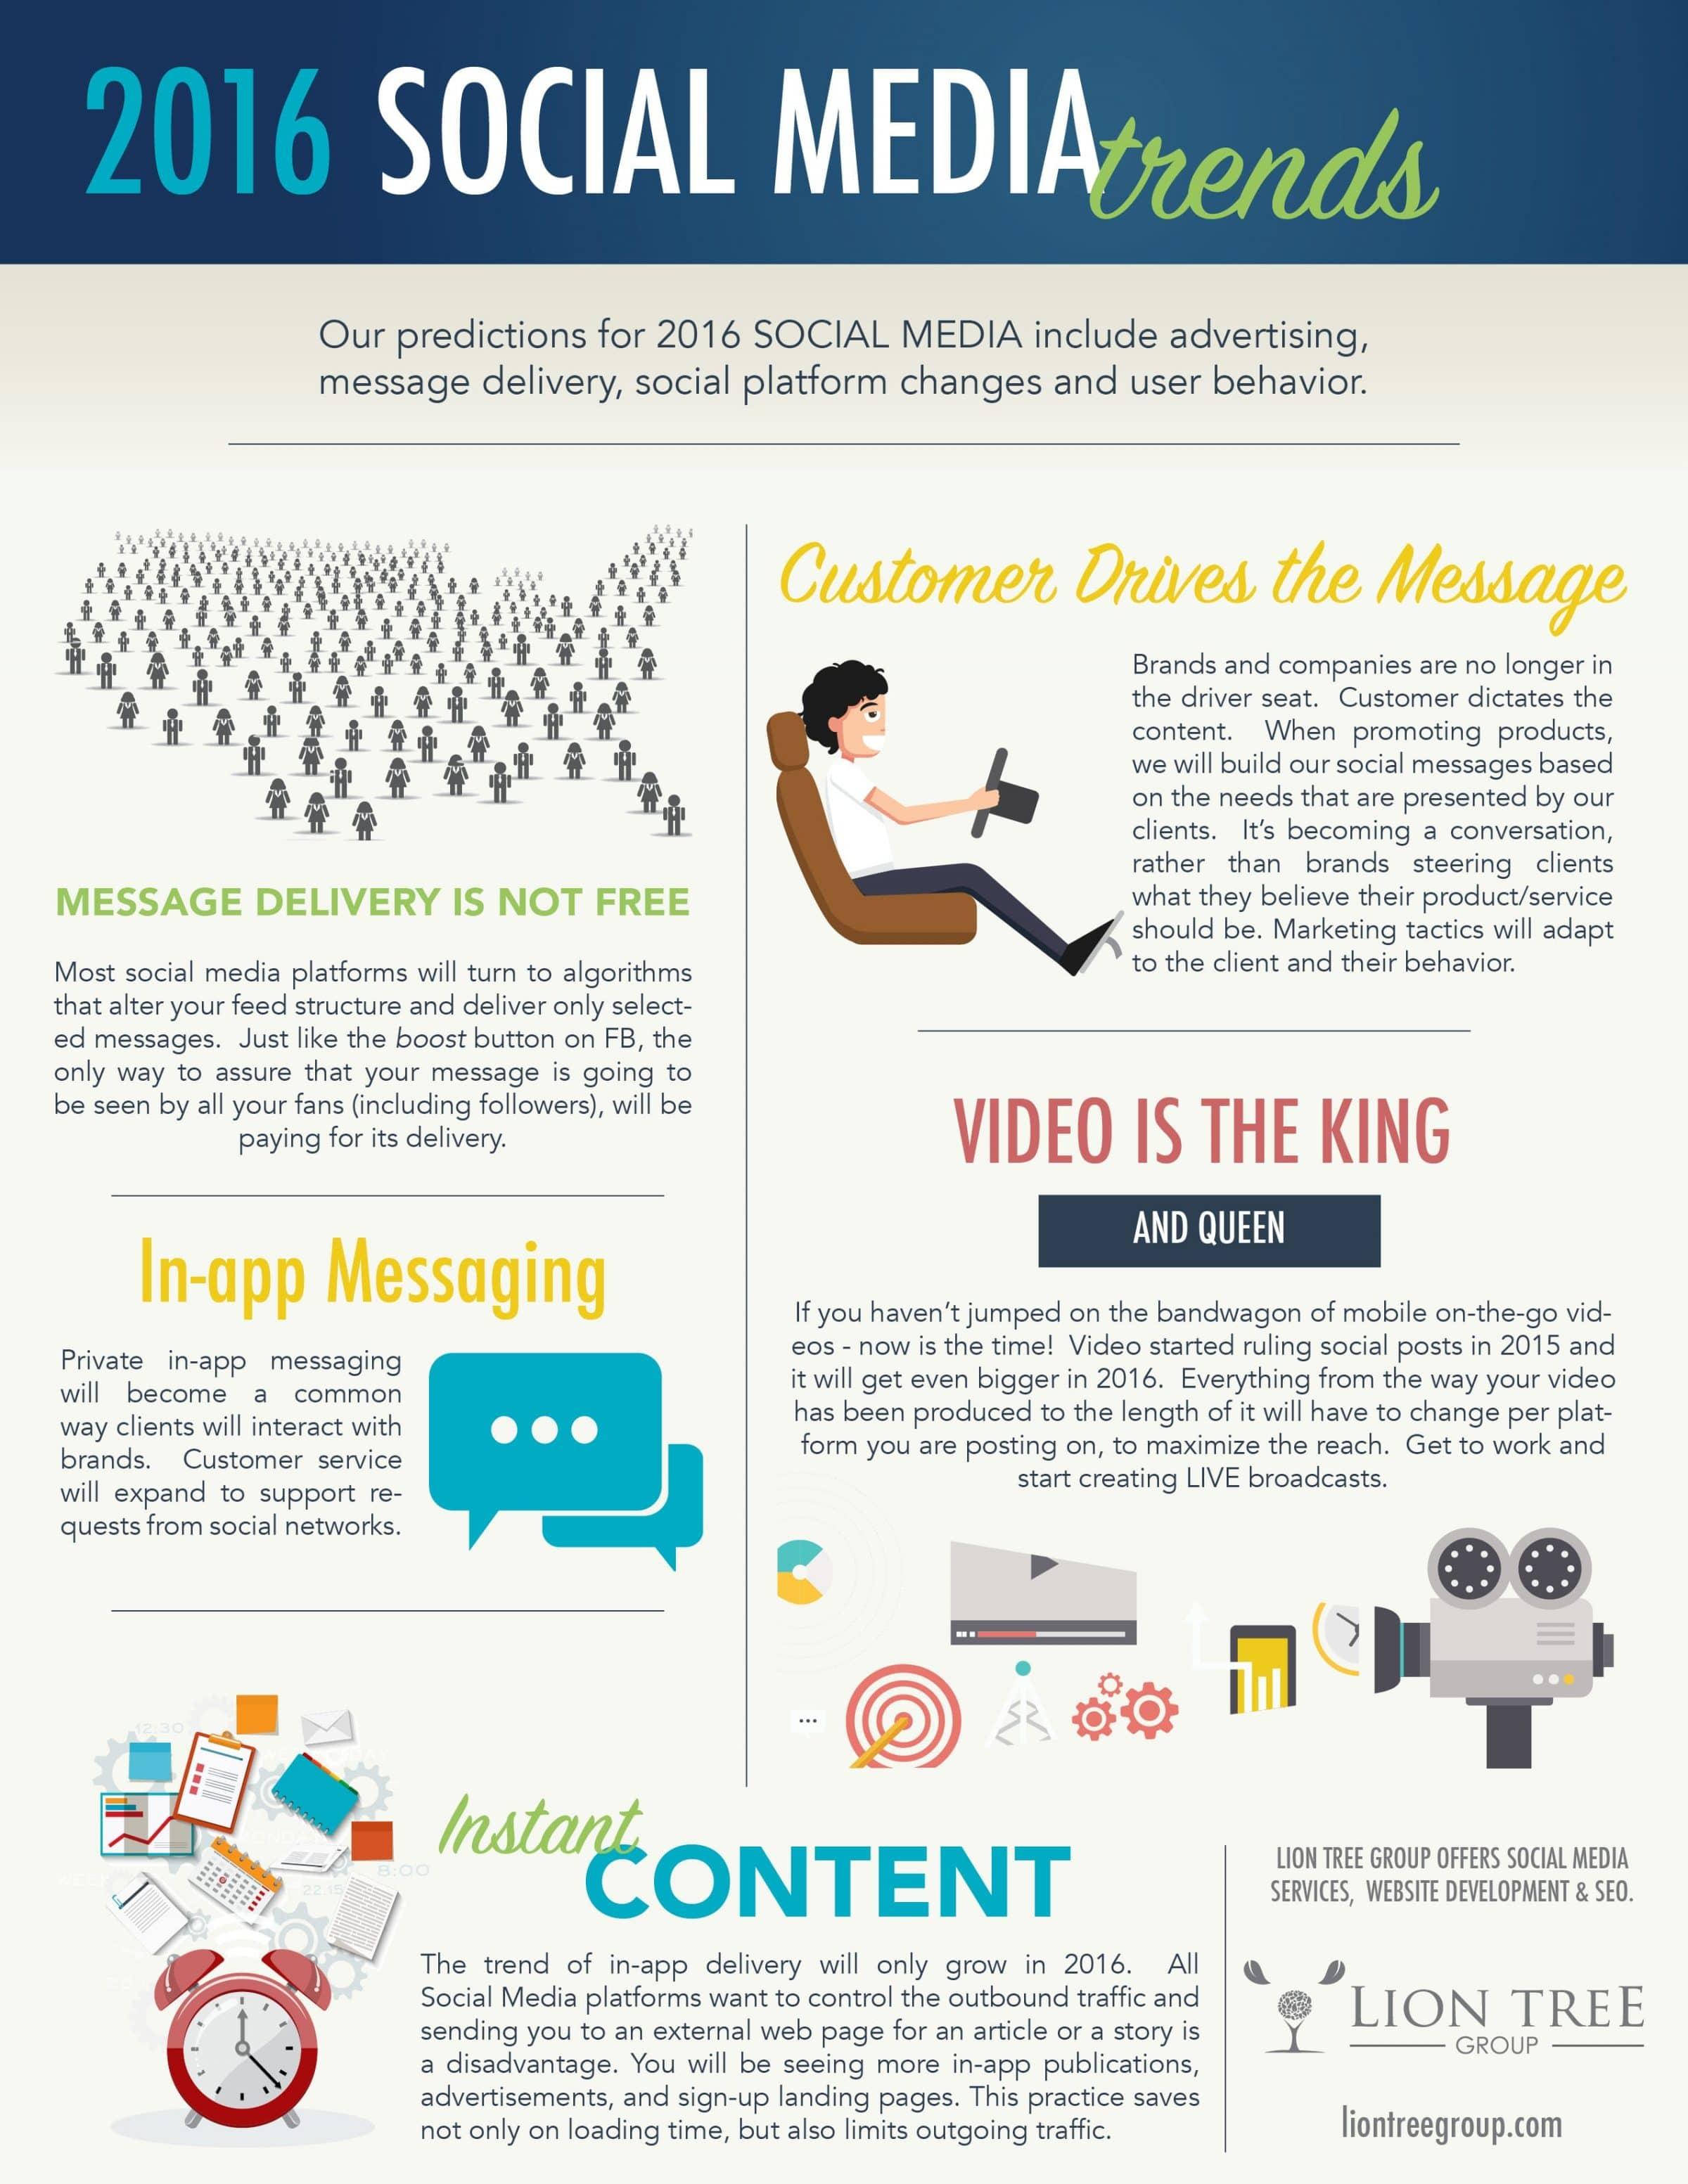 2016 Social Media Trends Lion Tree Group